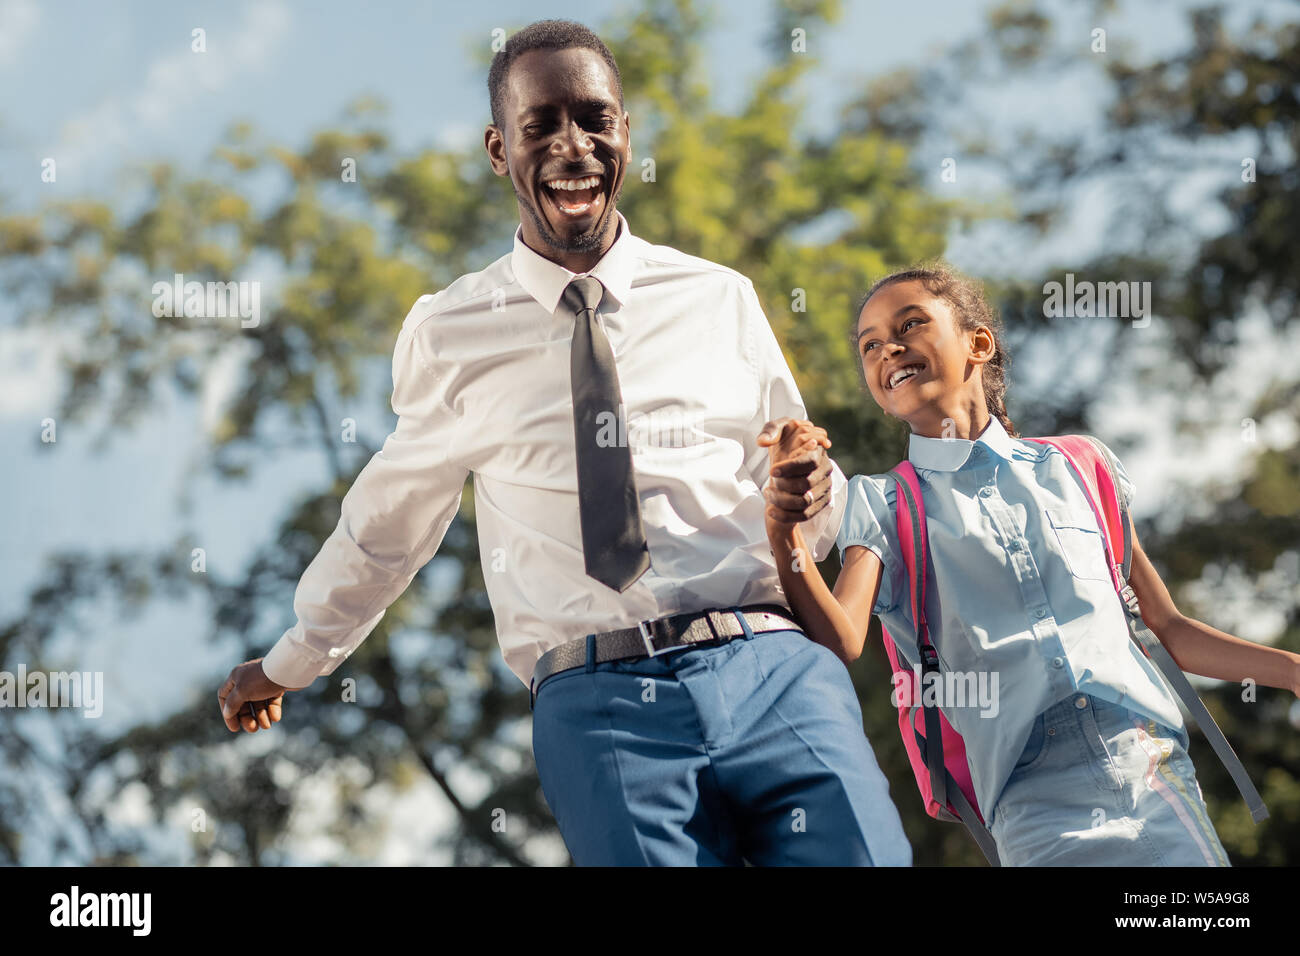 Asombrosa chica internacional divirtiéndose con su padre Foto de stock